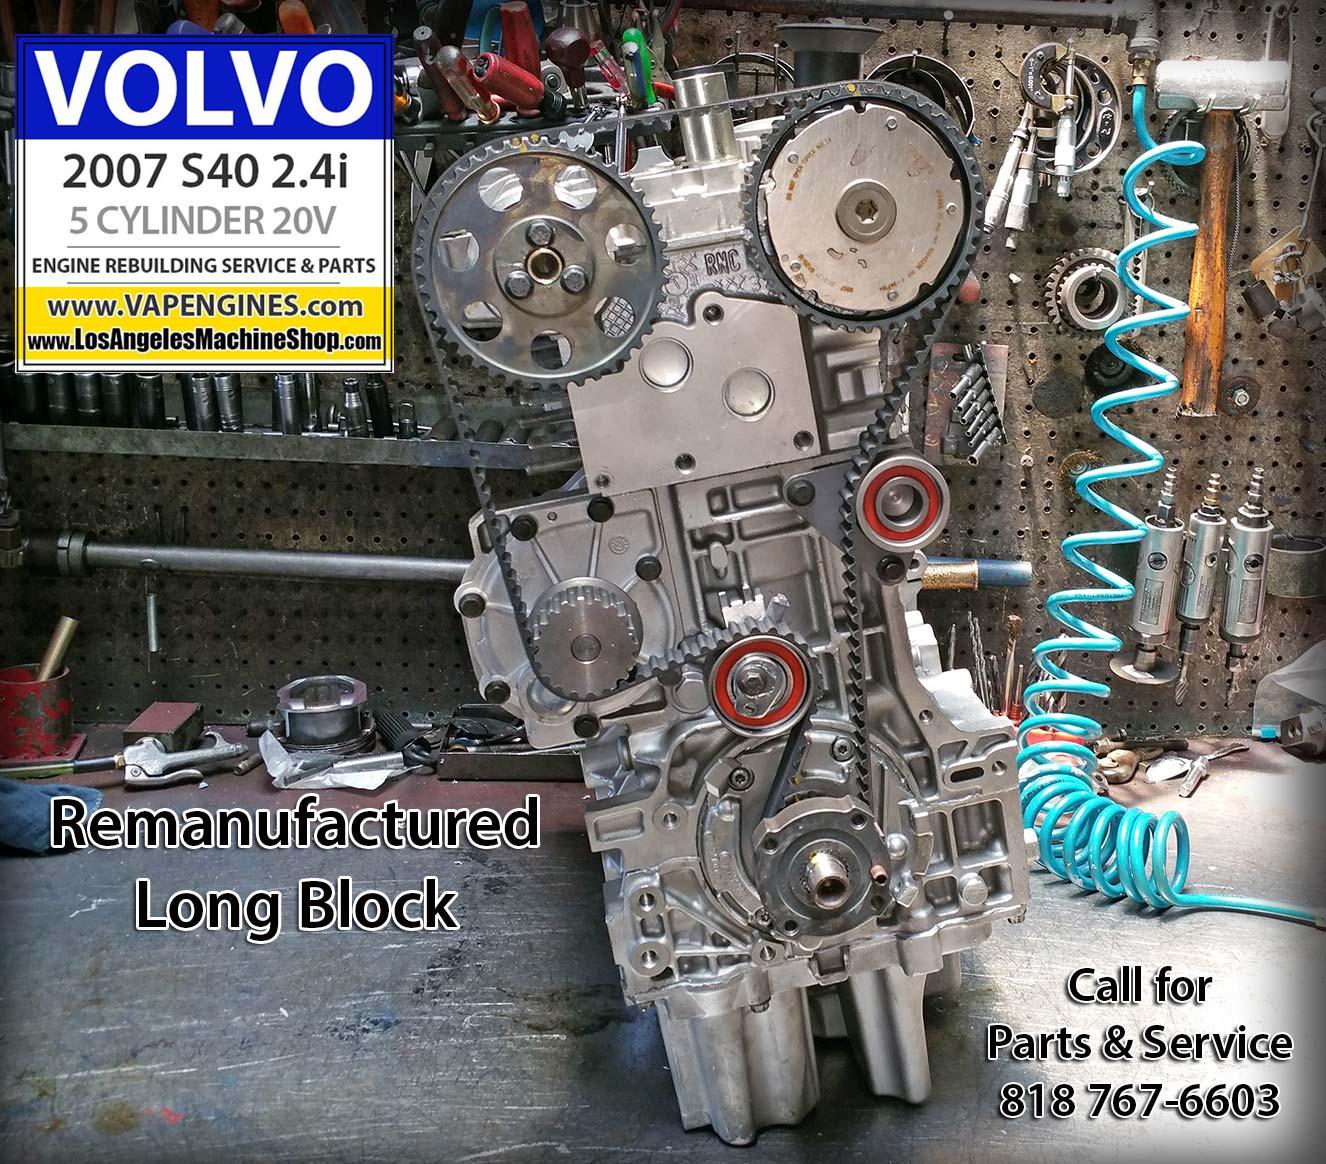 07 Volvo S40 2.4i Engine Rebuild - Los Angeles Machine Shop- Engine  Rebuilder|Auto Parts StoreLos Angeles Machine Shop